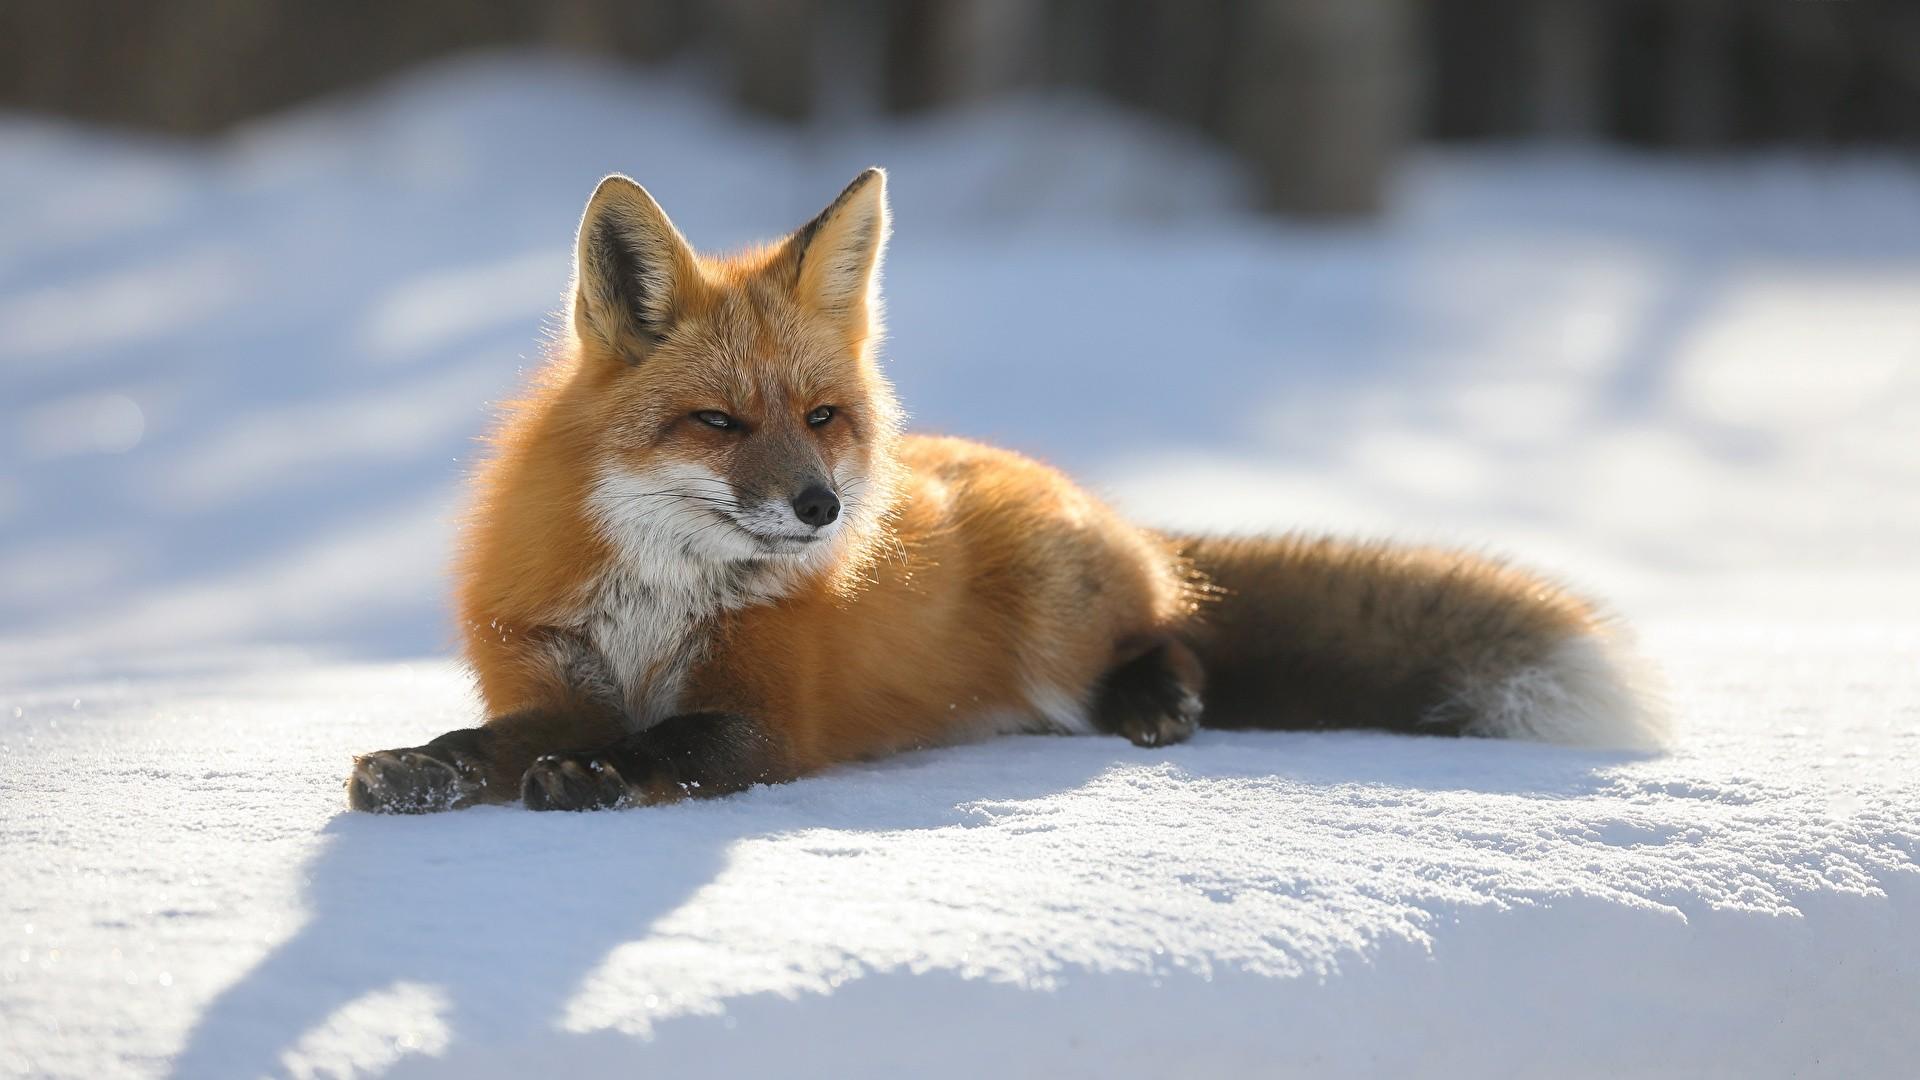 Winter Fox Wallpaper theme